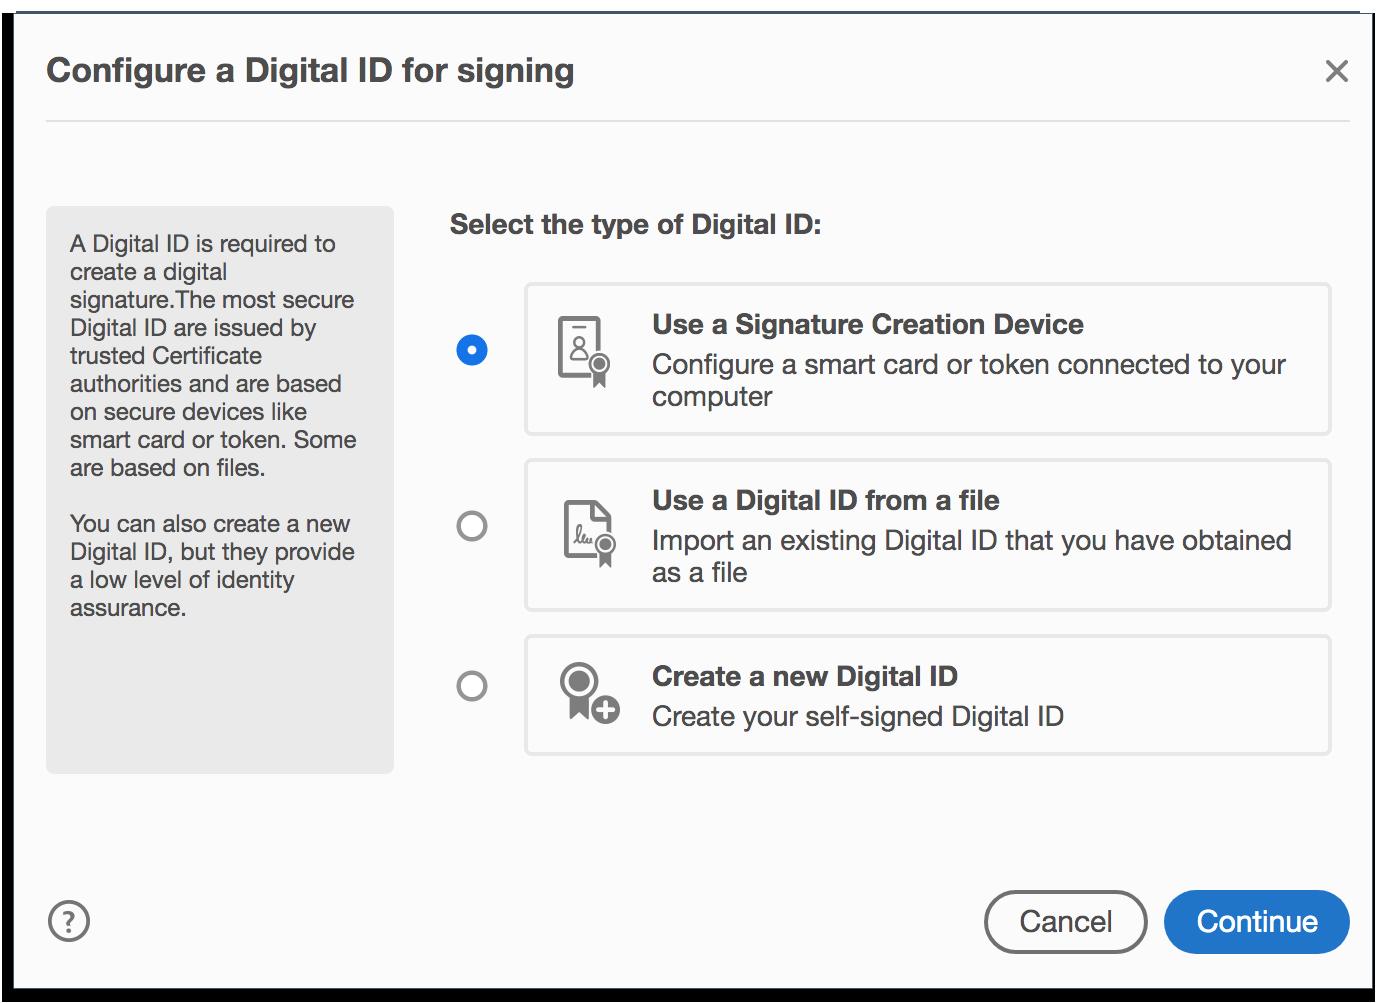 Configure a Digital ID in Adobe Acrobat